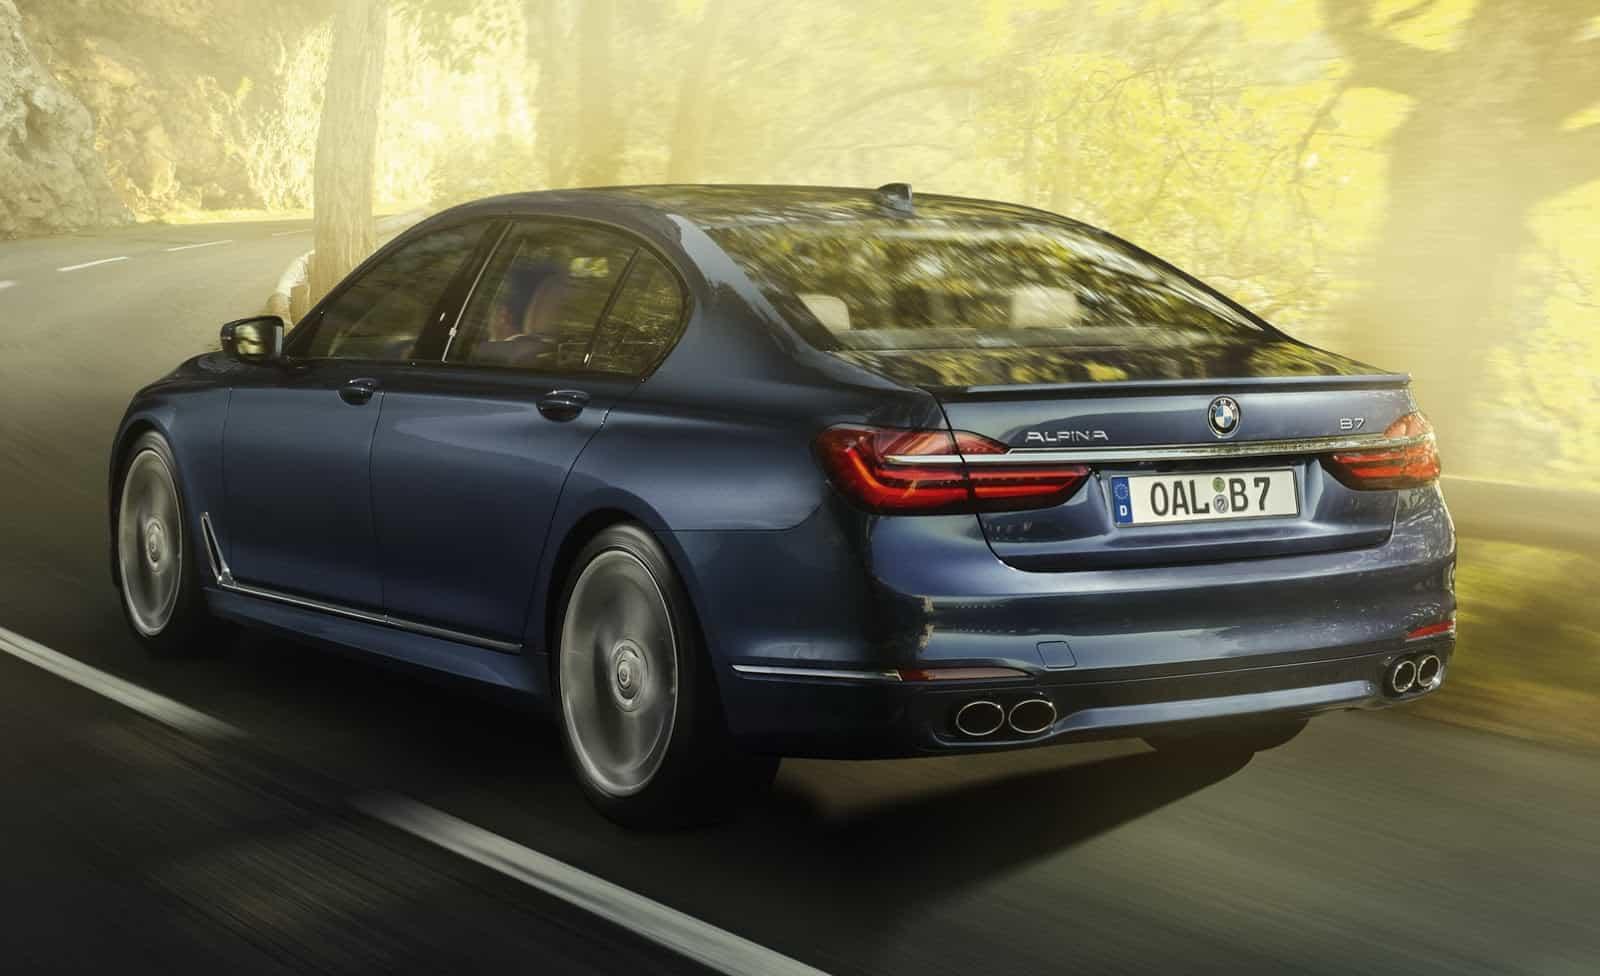 BMW-Alpina-B7-5